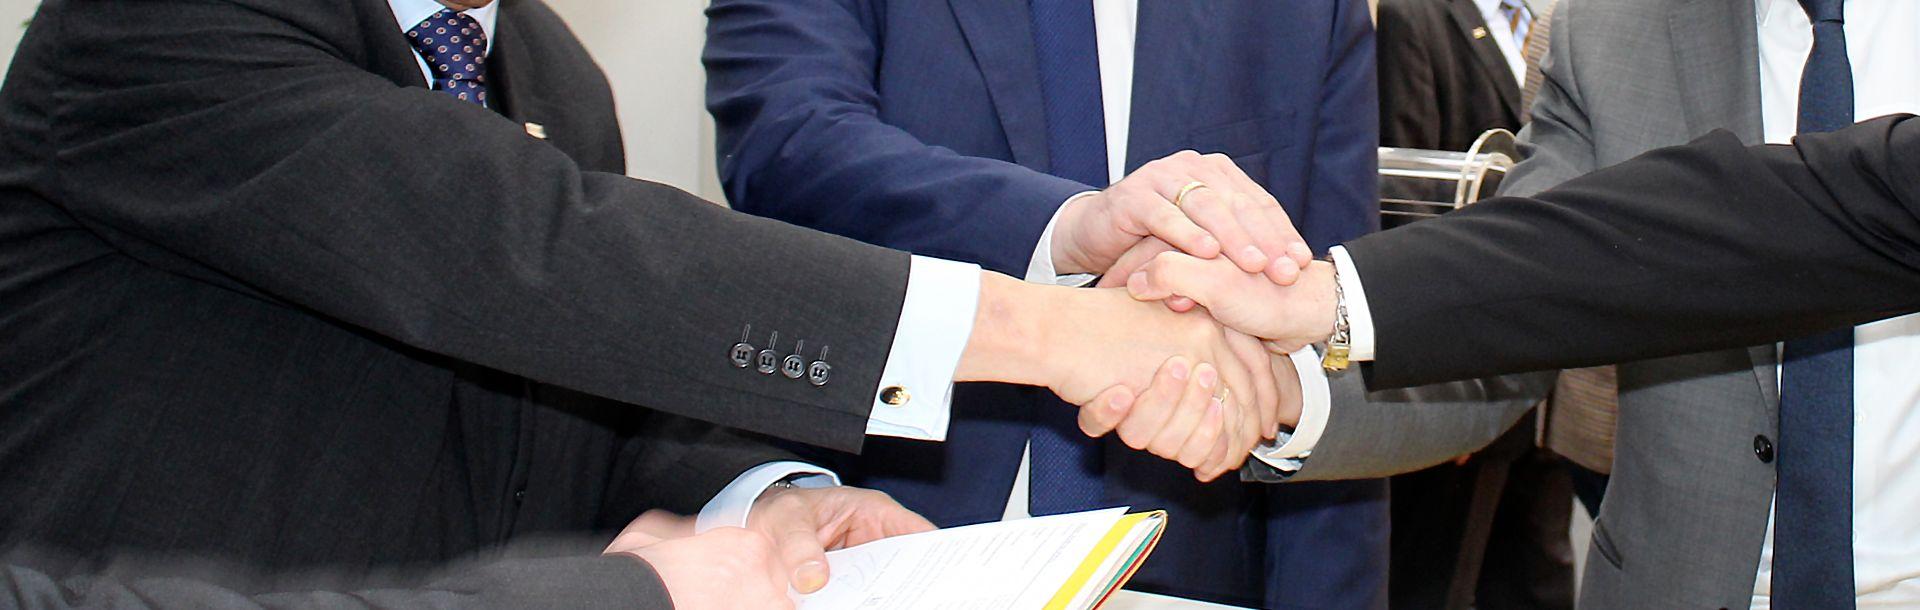 VINCI Energies Deutschland takes over majority share of ATHOS Unternehmensberatung GmbH